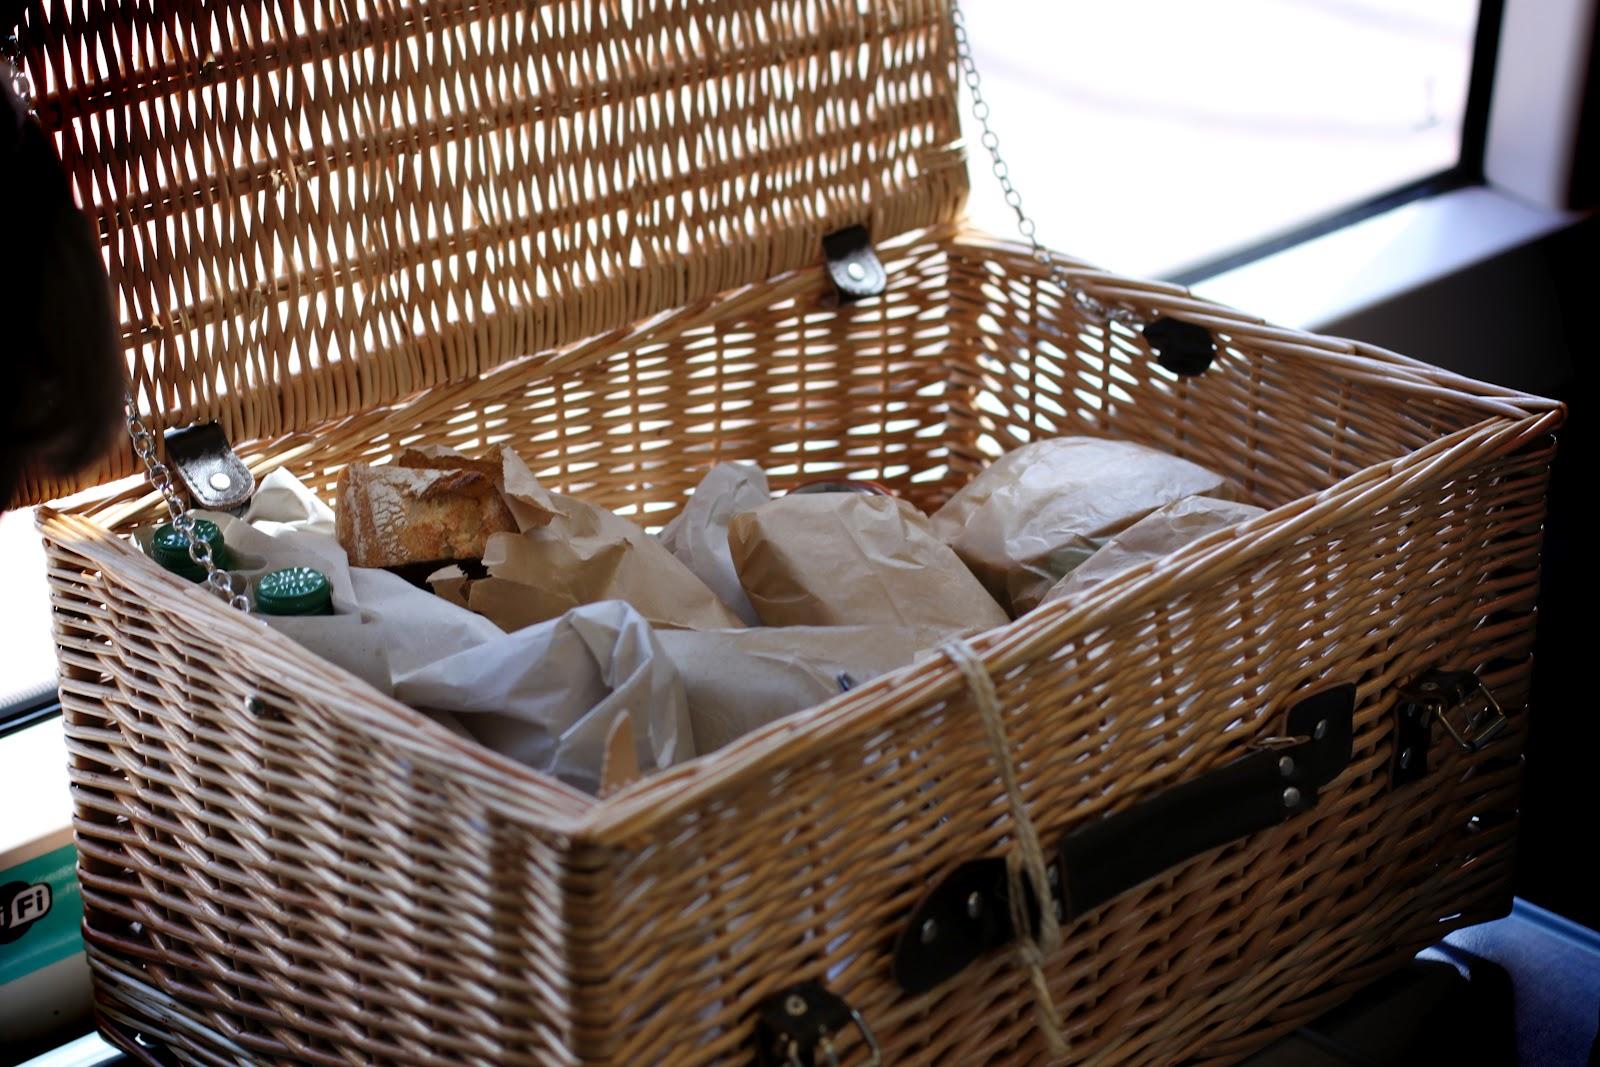 Bistrotheque picnic hamper